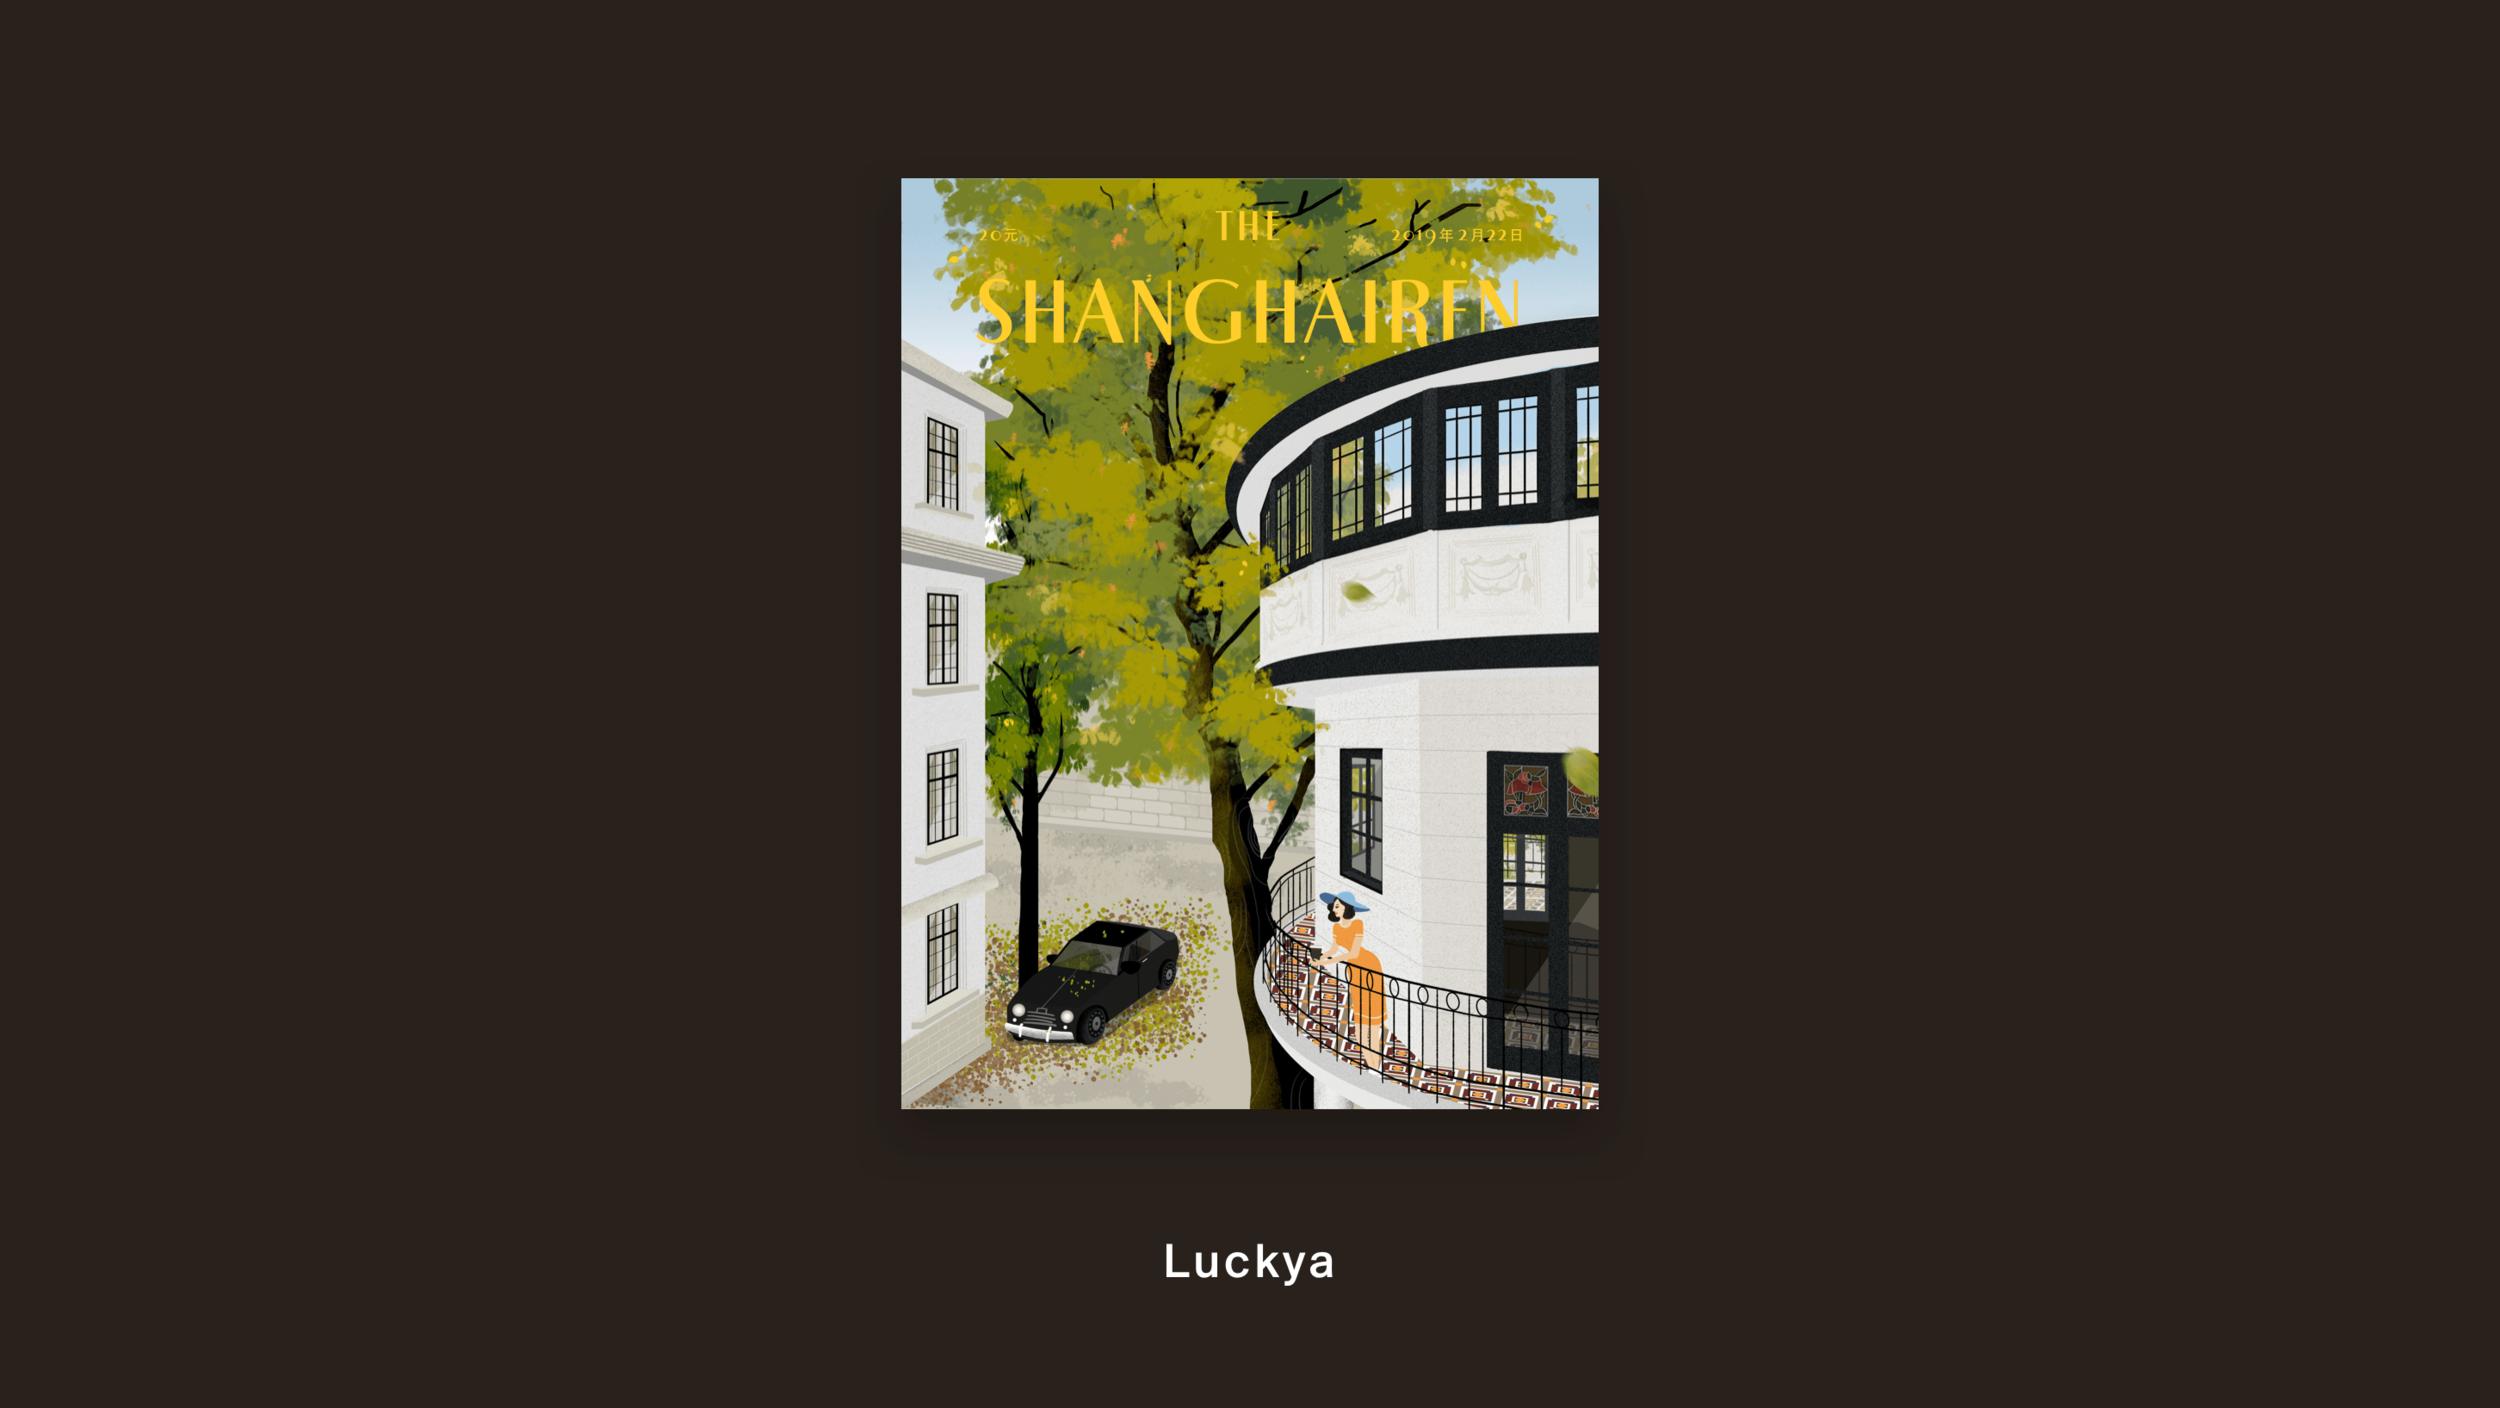 © Luckya